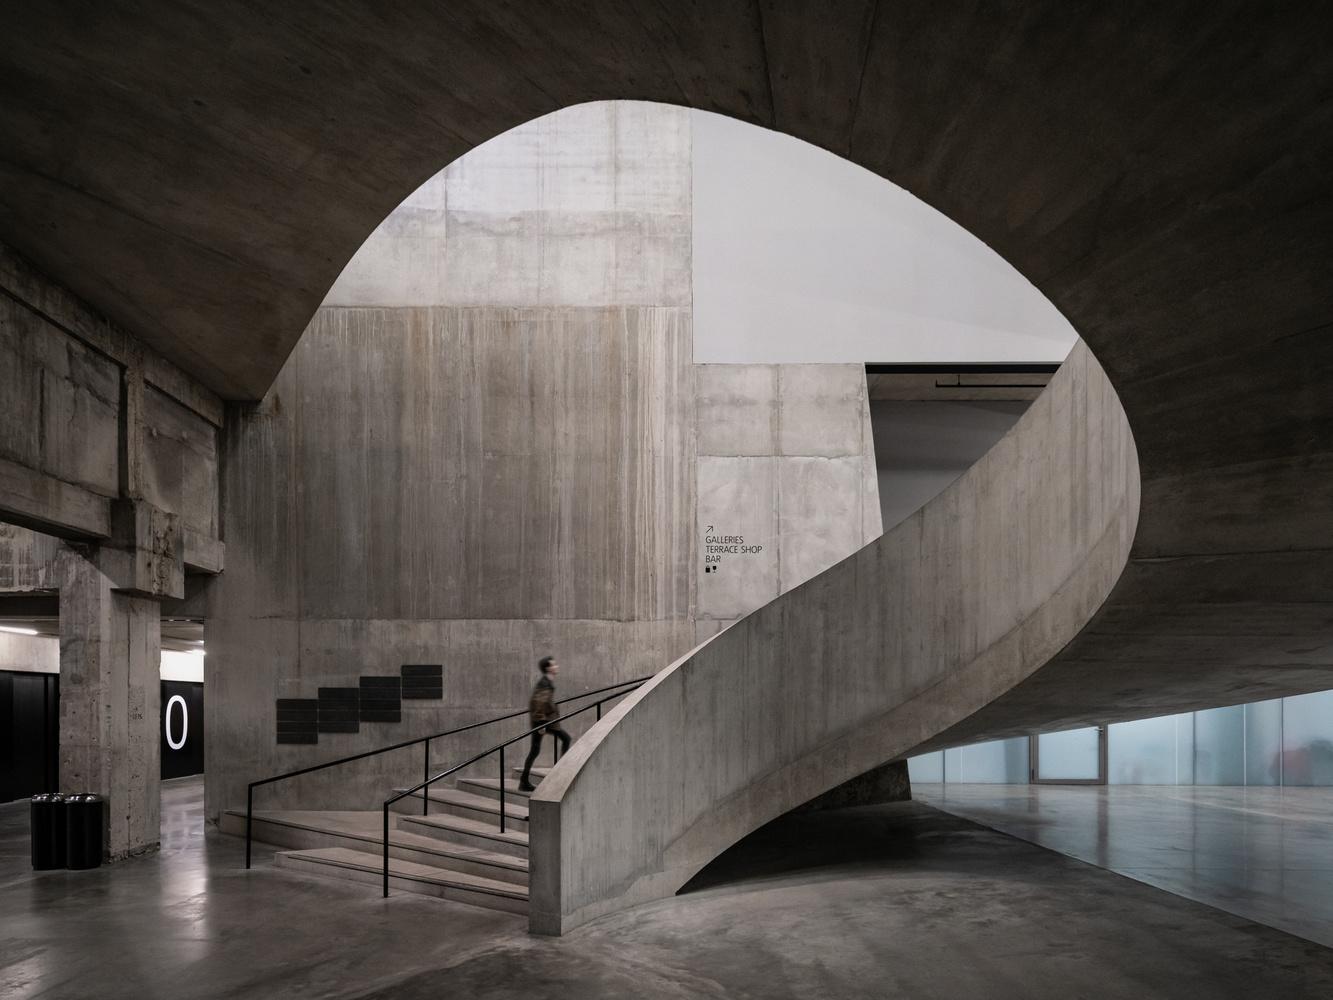 The Tanks   Tate Modern by Sebastian Grundgeir